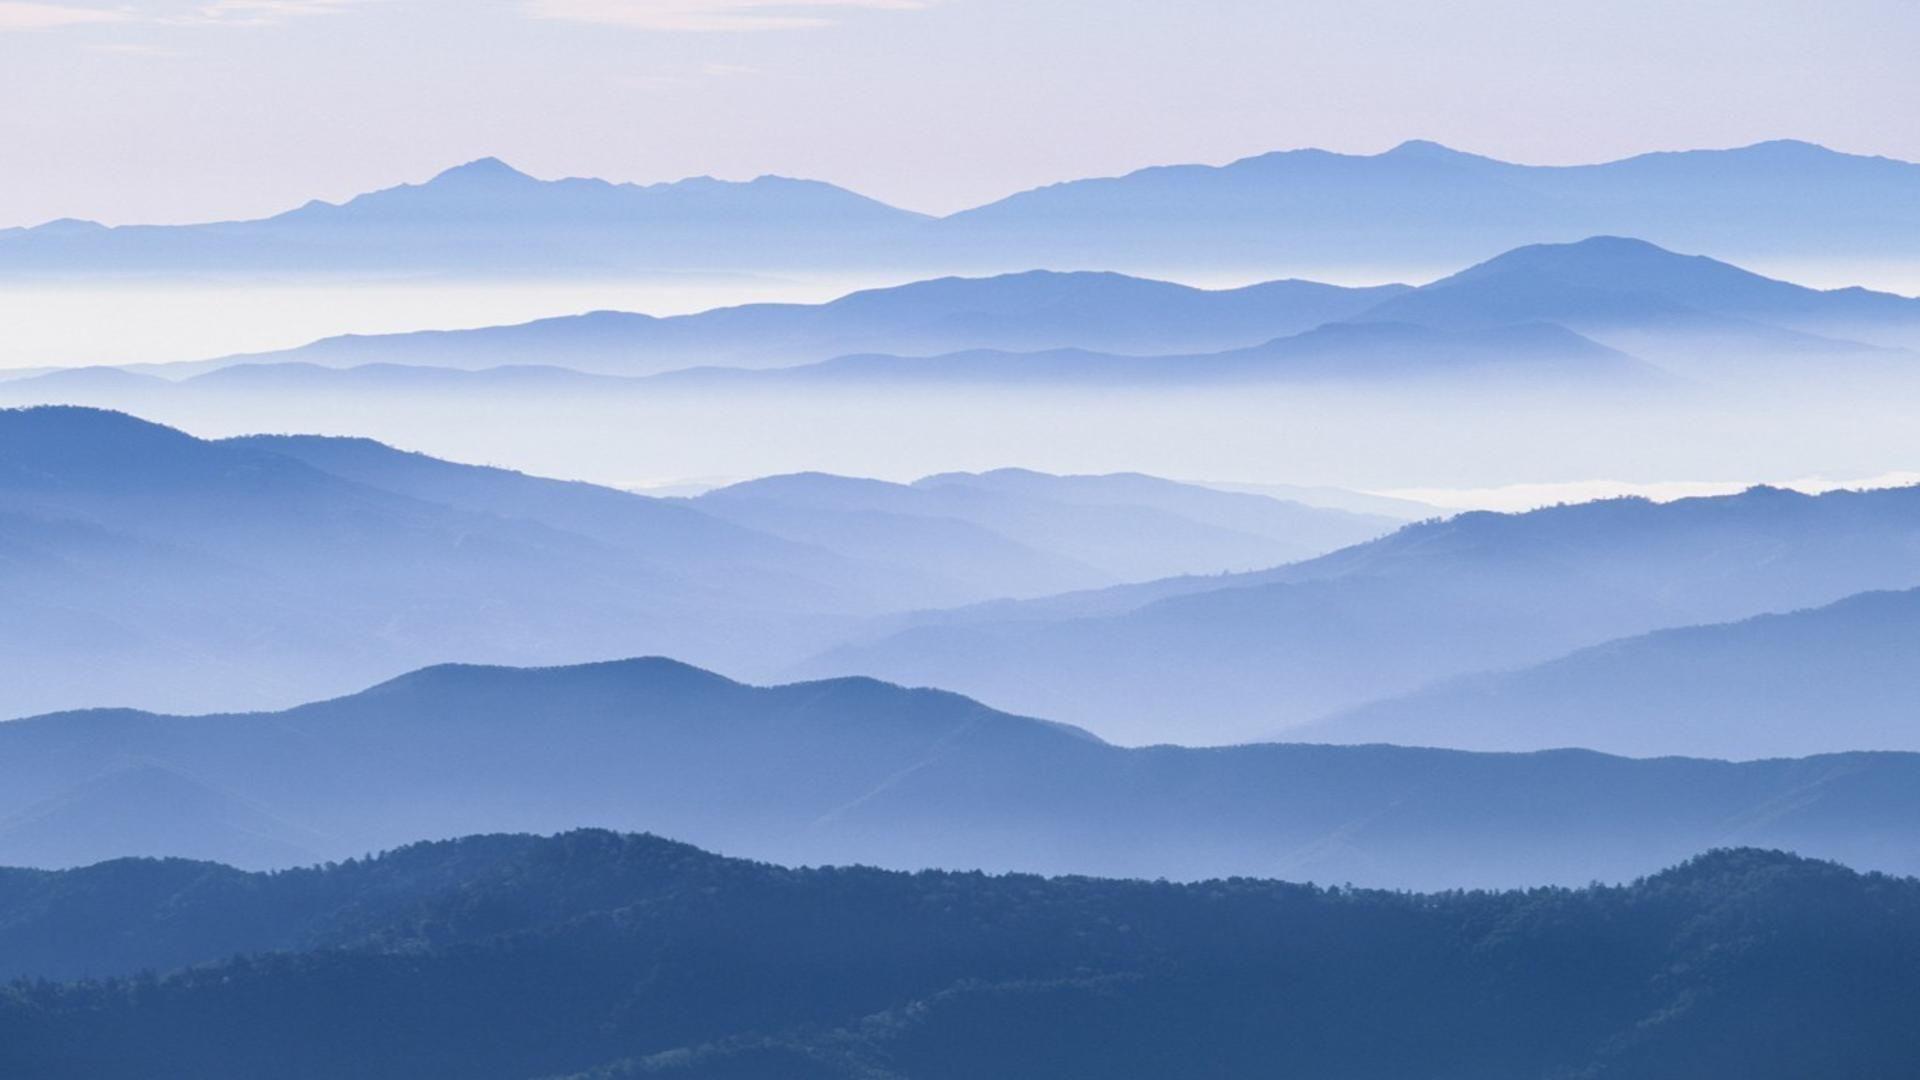 Japan Blue Mountains Miyukiutada Free Desktop Background Landscape Wallpaper Mountain Wallpaper Active Wallpaper